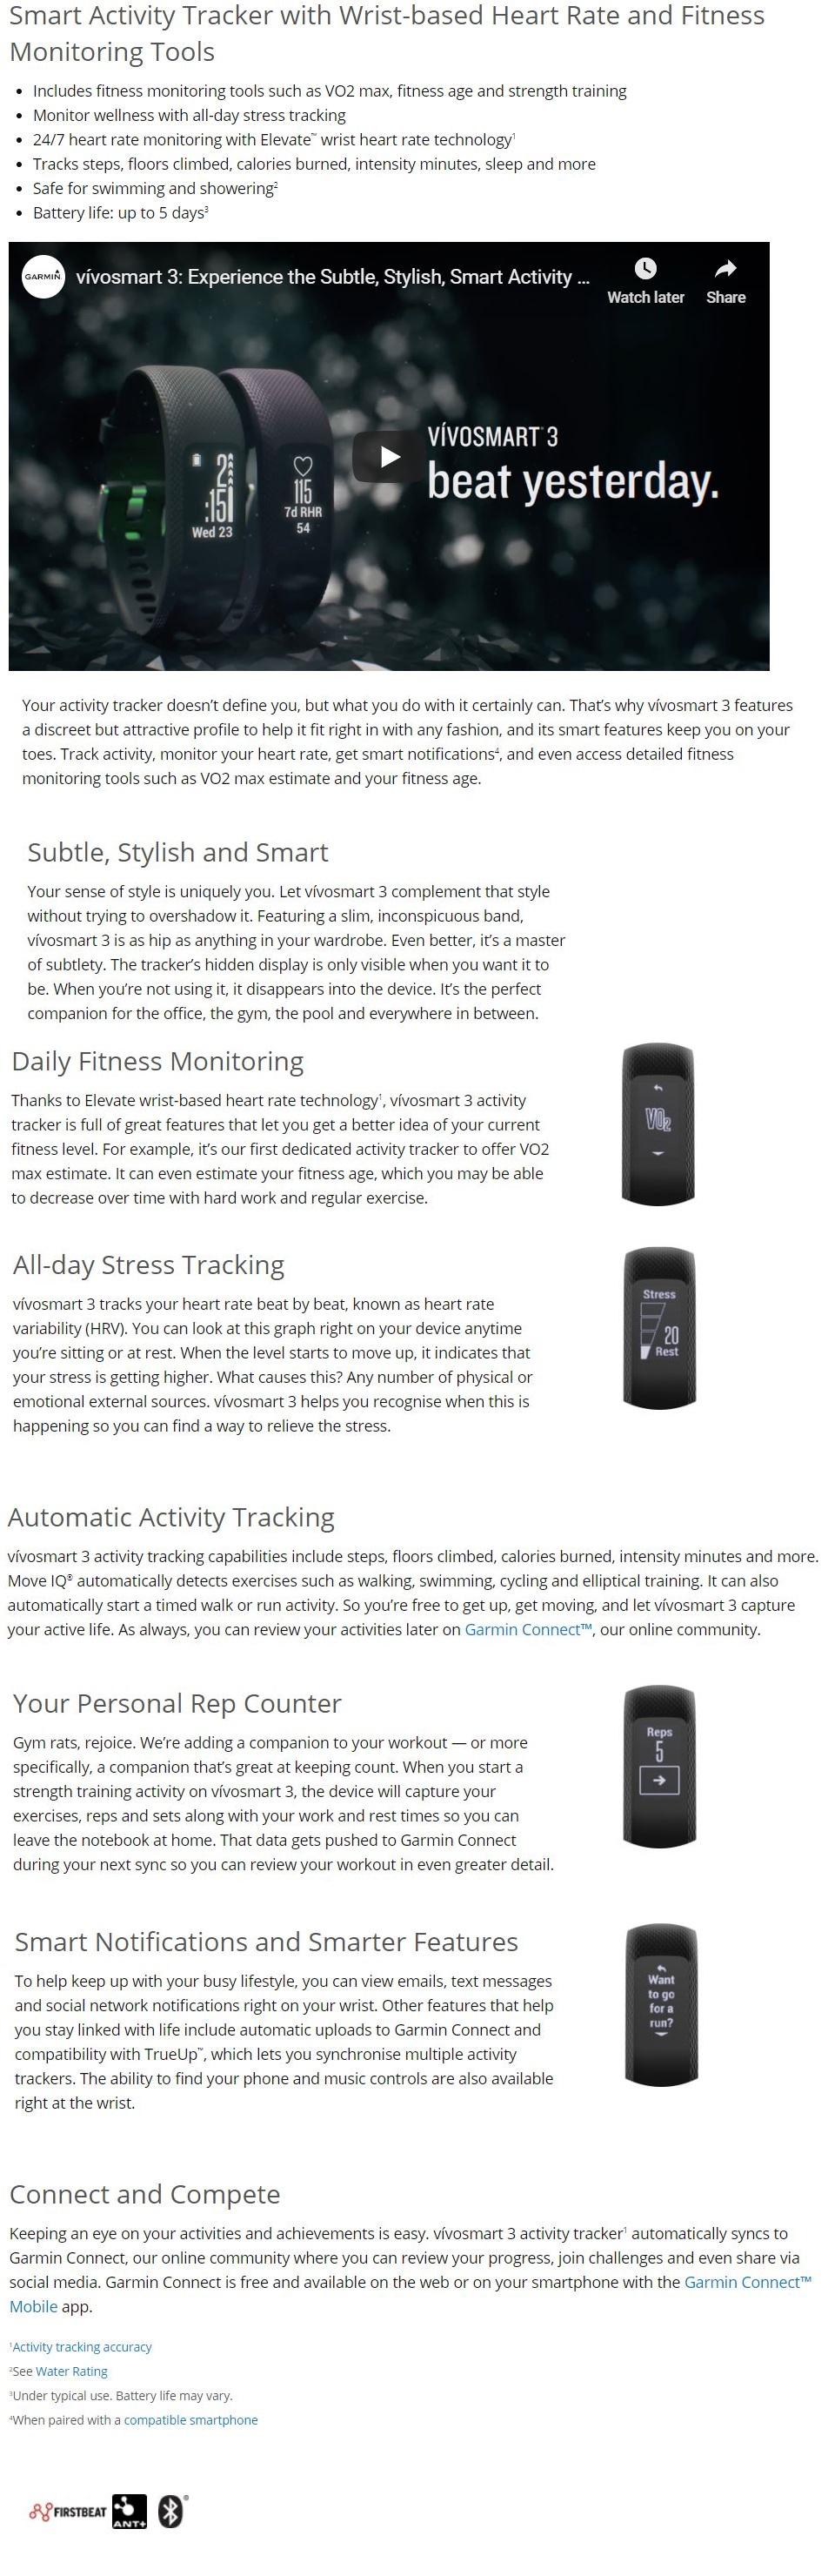 OFFICIAL WARRANTY) Garmin Vivosmart 3 Blue Activity Tracker with